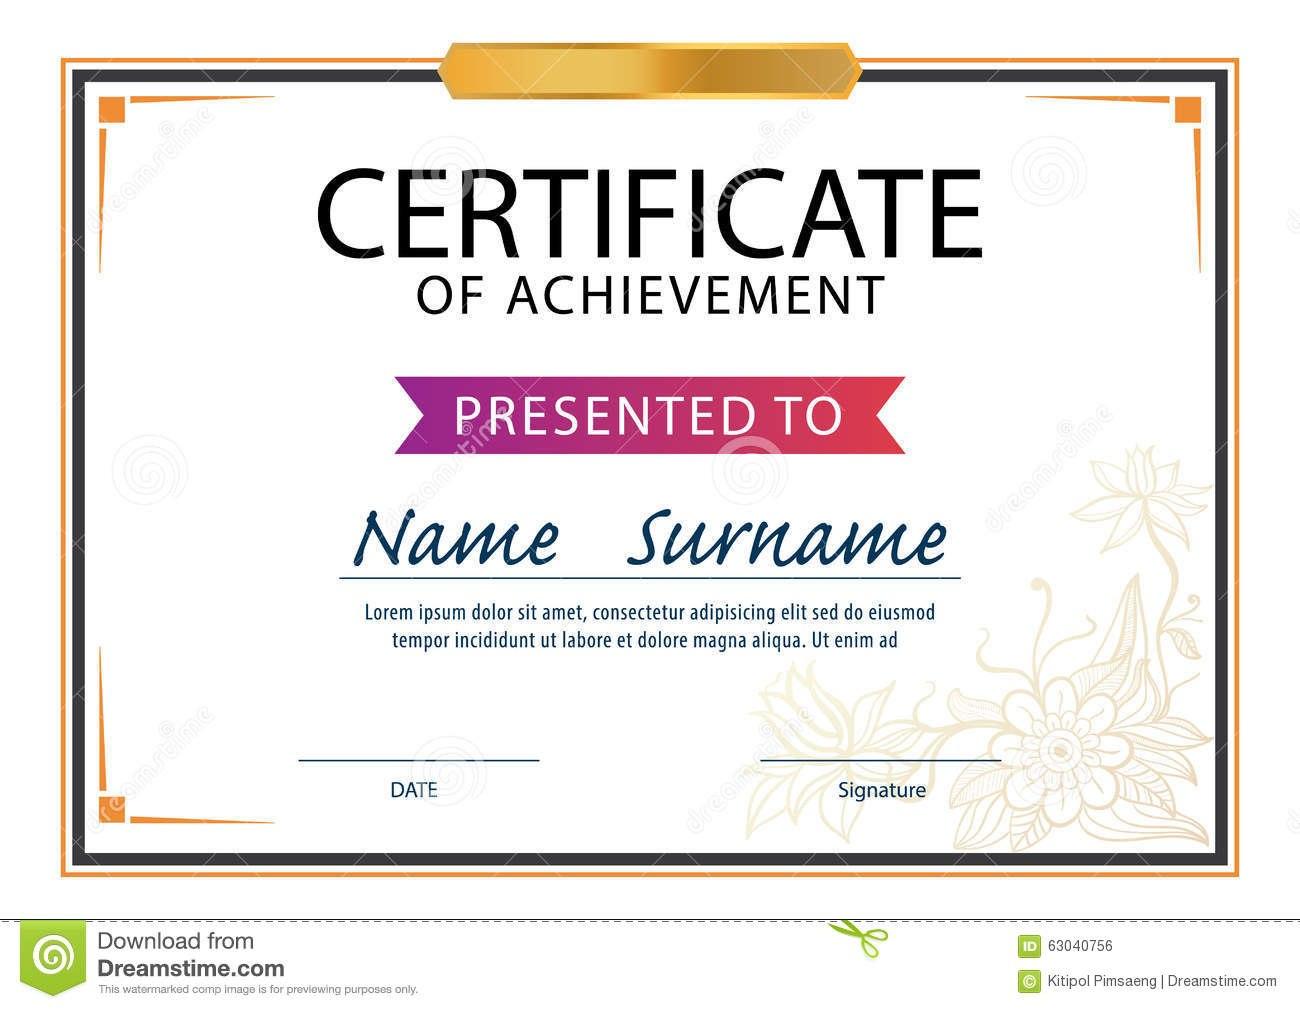 Softball Certificate Templates Choice Image Critique Essay Topics With Regard To Free Softball Certificate Templates